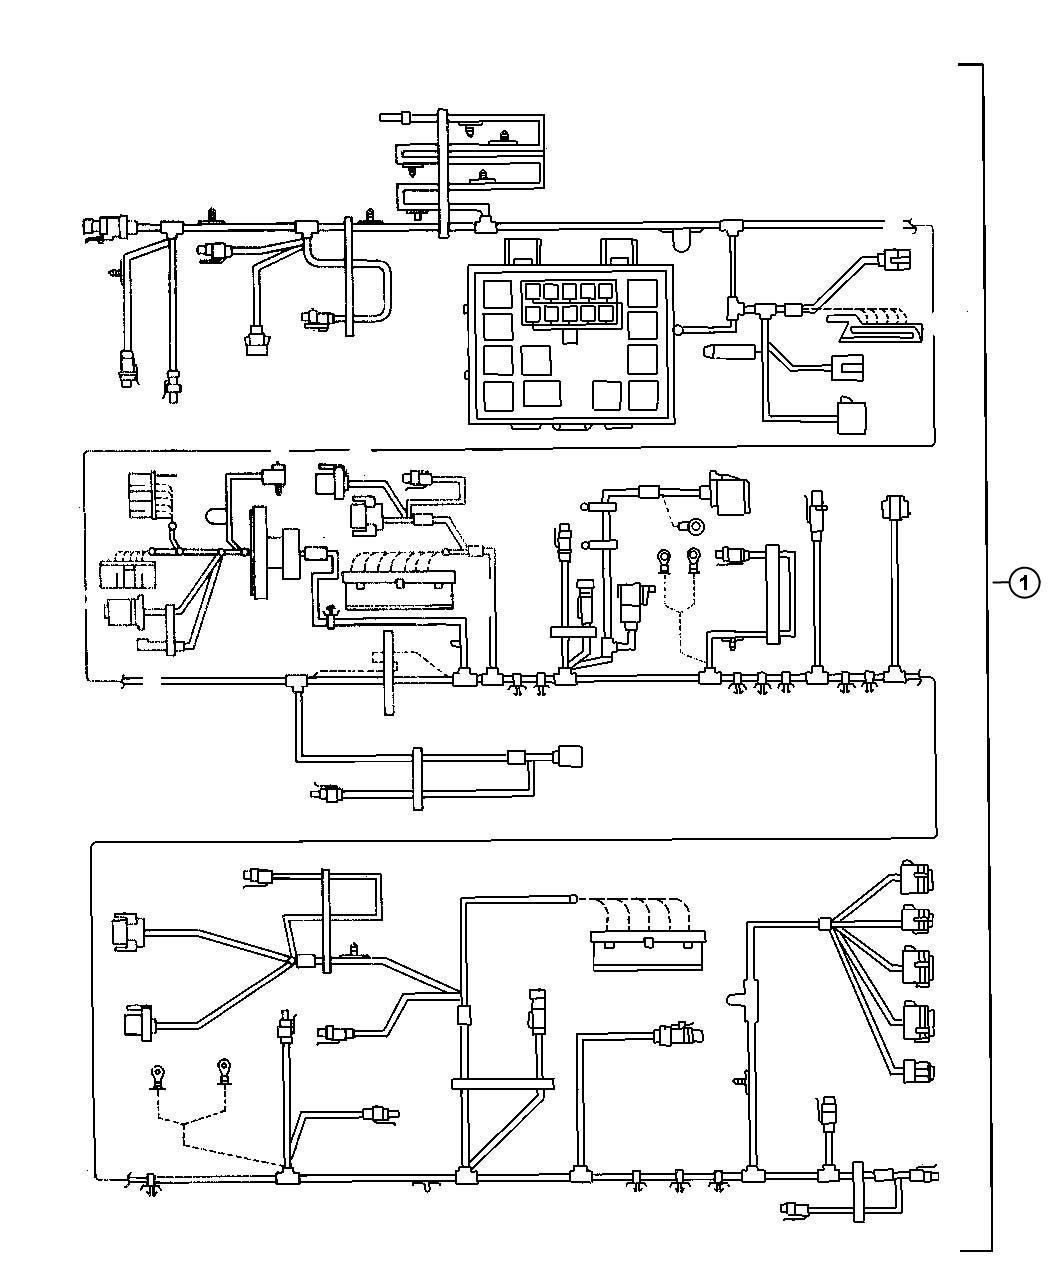 Chrysler Concorde Fuse Fuse Cartridge J Case 40 Amp